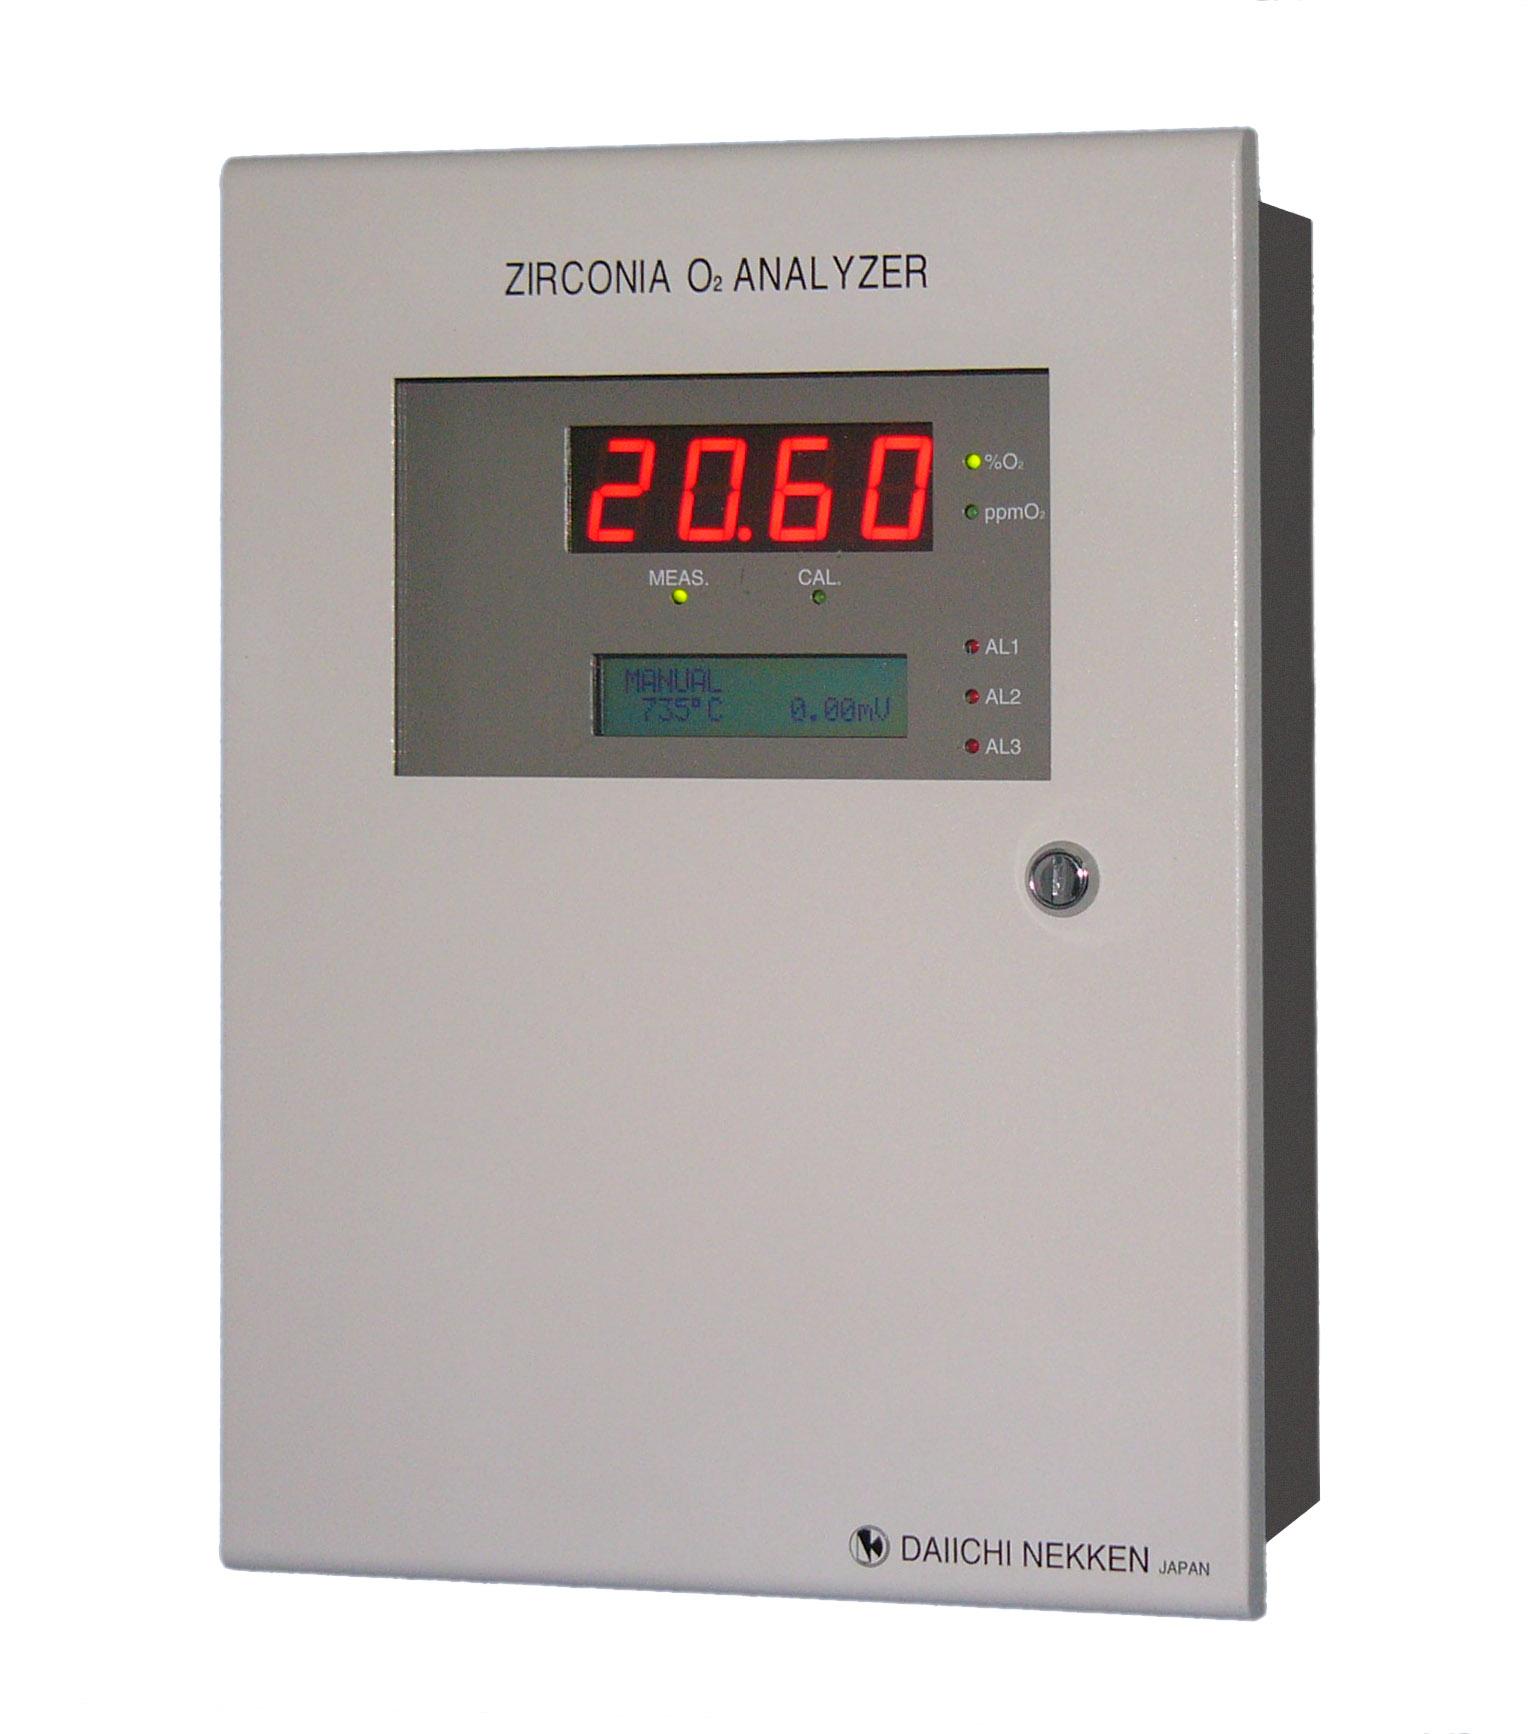 analyzer, oxygen, gas, วัด, ก๊าซ,ออกซิเจน, O2, เครื่องวิเคราะห์, detector, daiichi, nekken, ราคา, ระยอง,รับติดตั้ง,ออกแบบ,เครื่องเช่า, แก๊ส ,ilinos ,Roemouse ,NGK ,Dong ,yong ,Rapidox ,AMI ,Hitech ,Metler